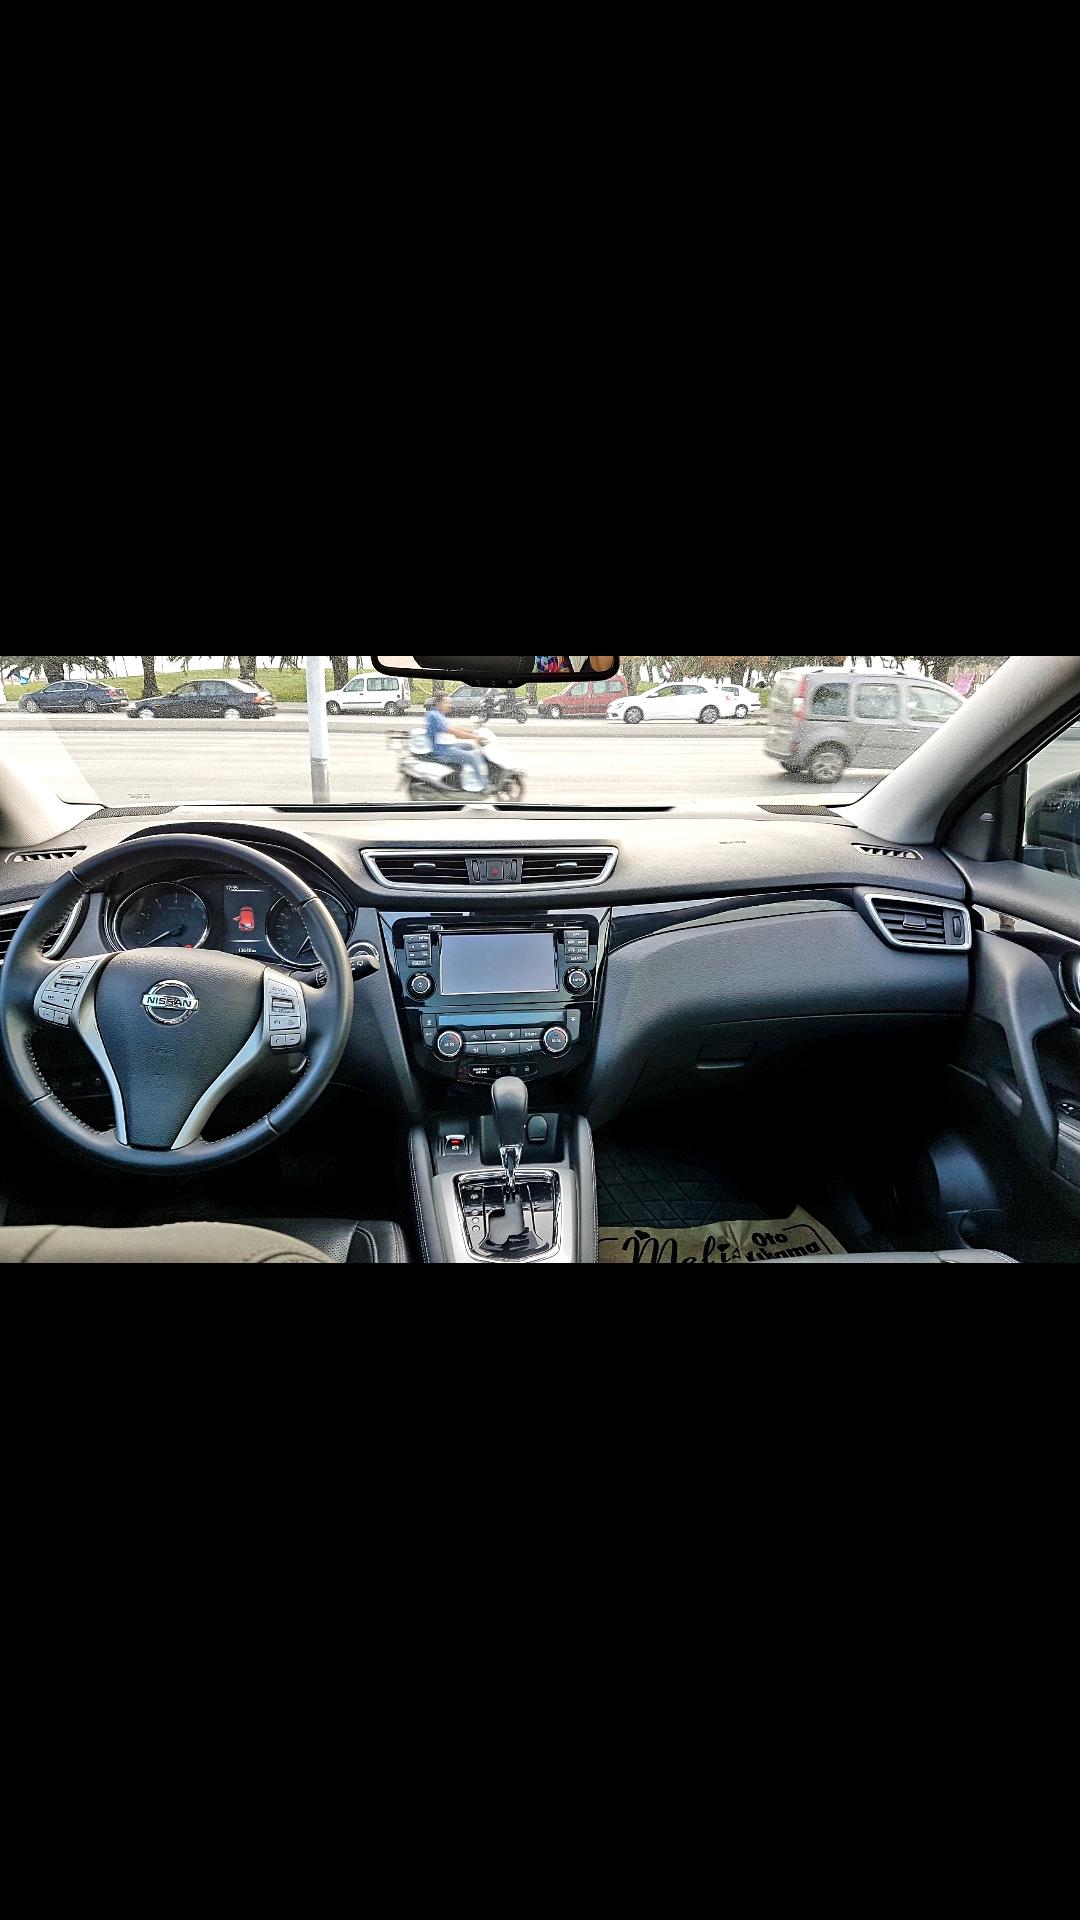 NISSAN Qashqai 2016 Model Benzin Otomatik Vites Kiralik Araç - 143B